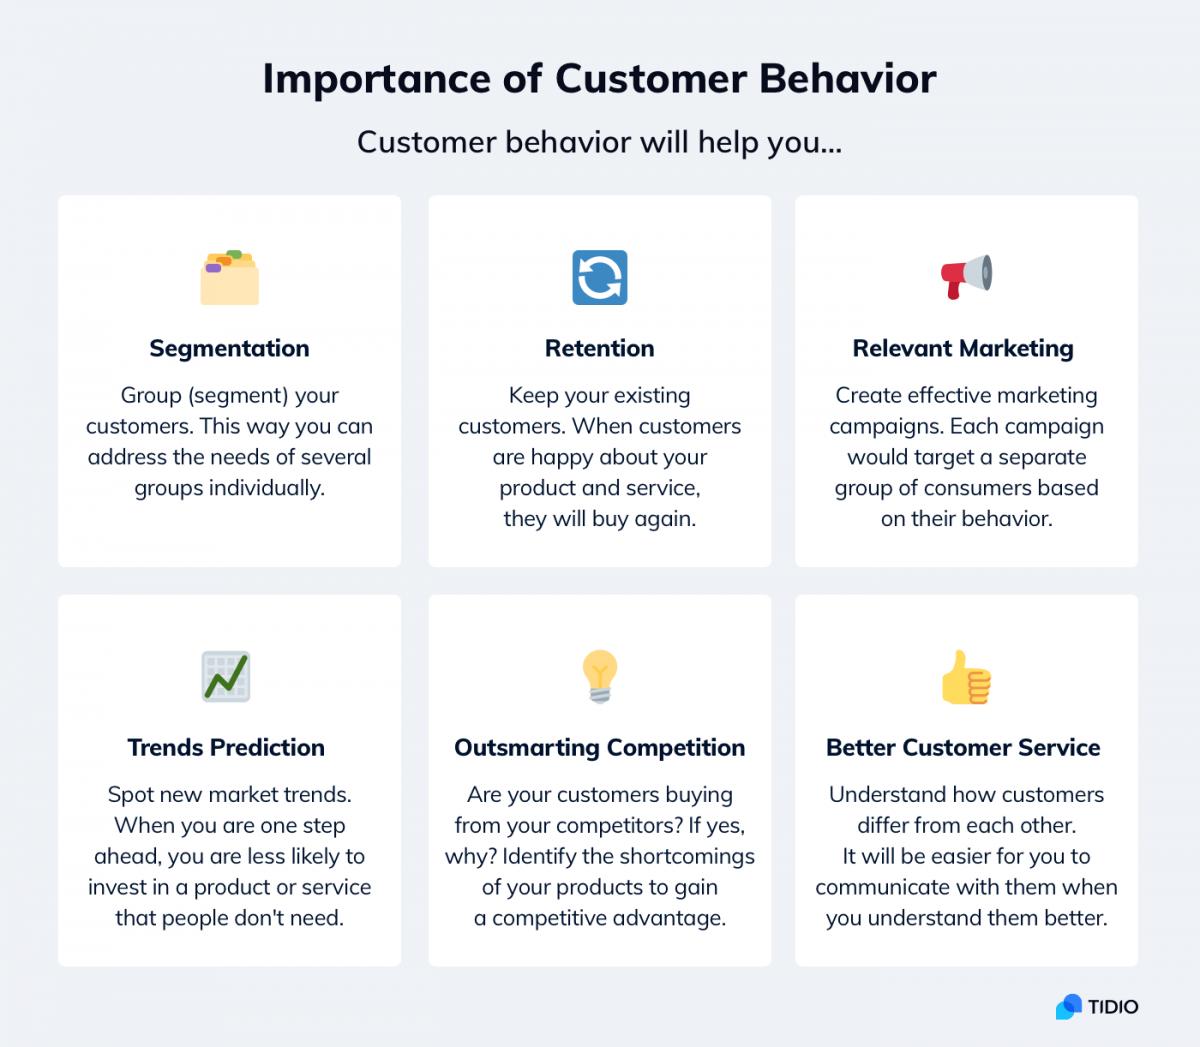 Importanc of customer behavior - infographic